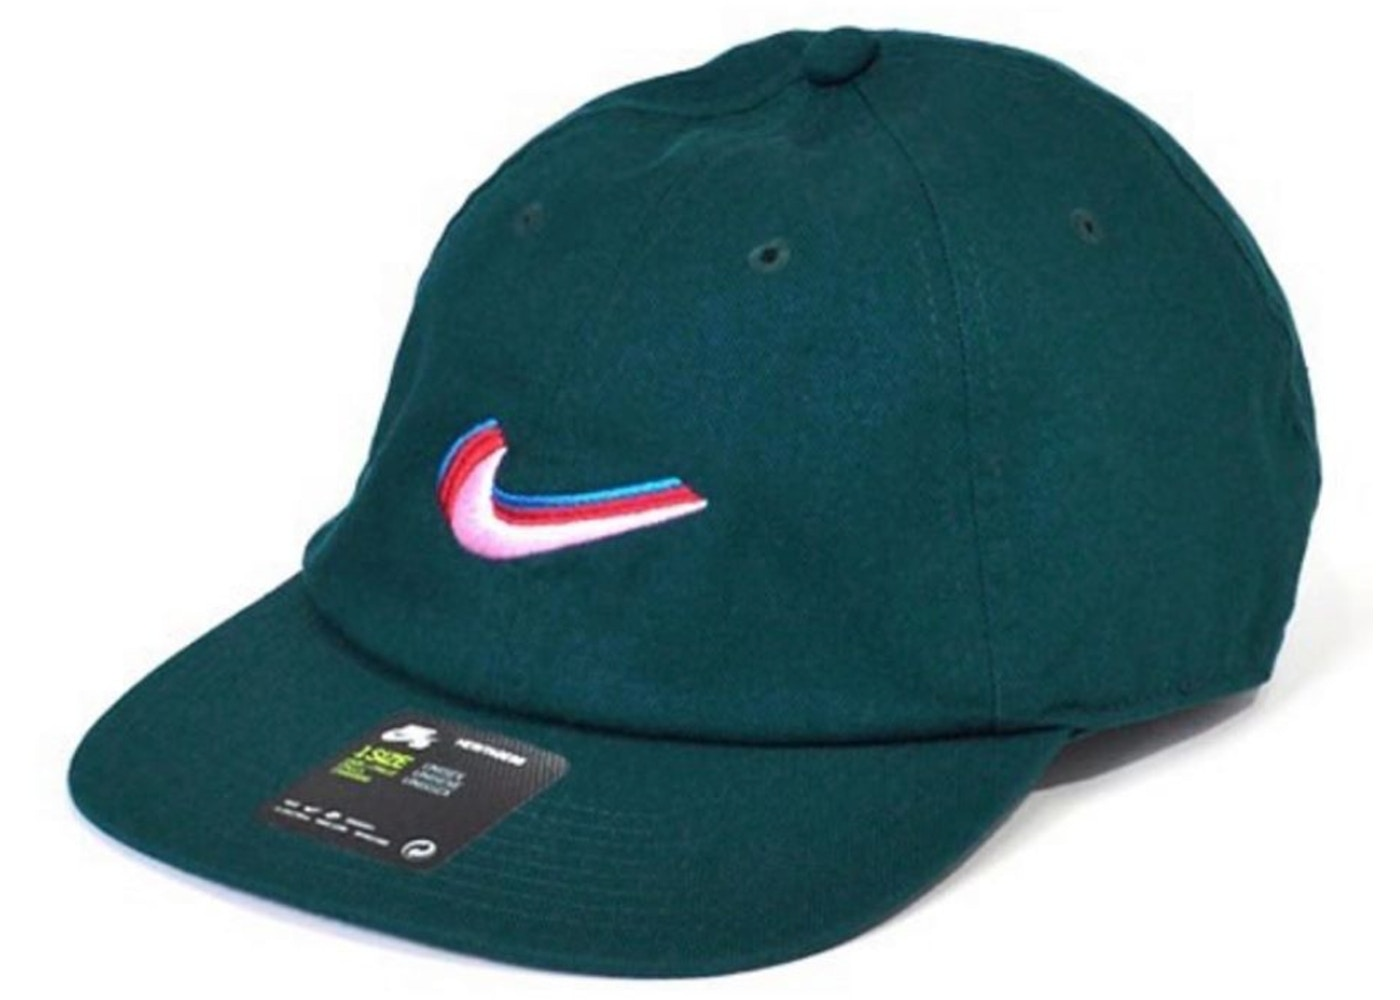 36dfc200 Nike x Parra Cap Forest Green - FW19